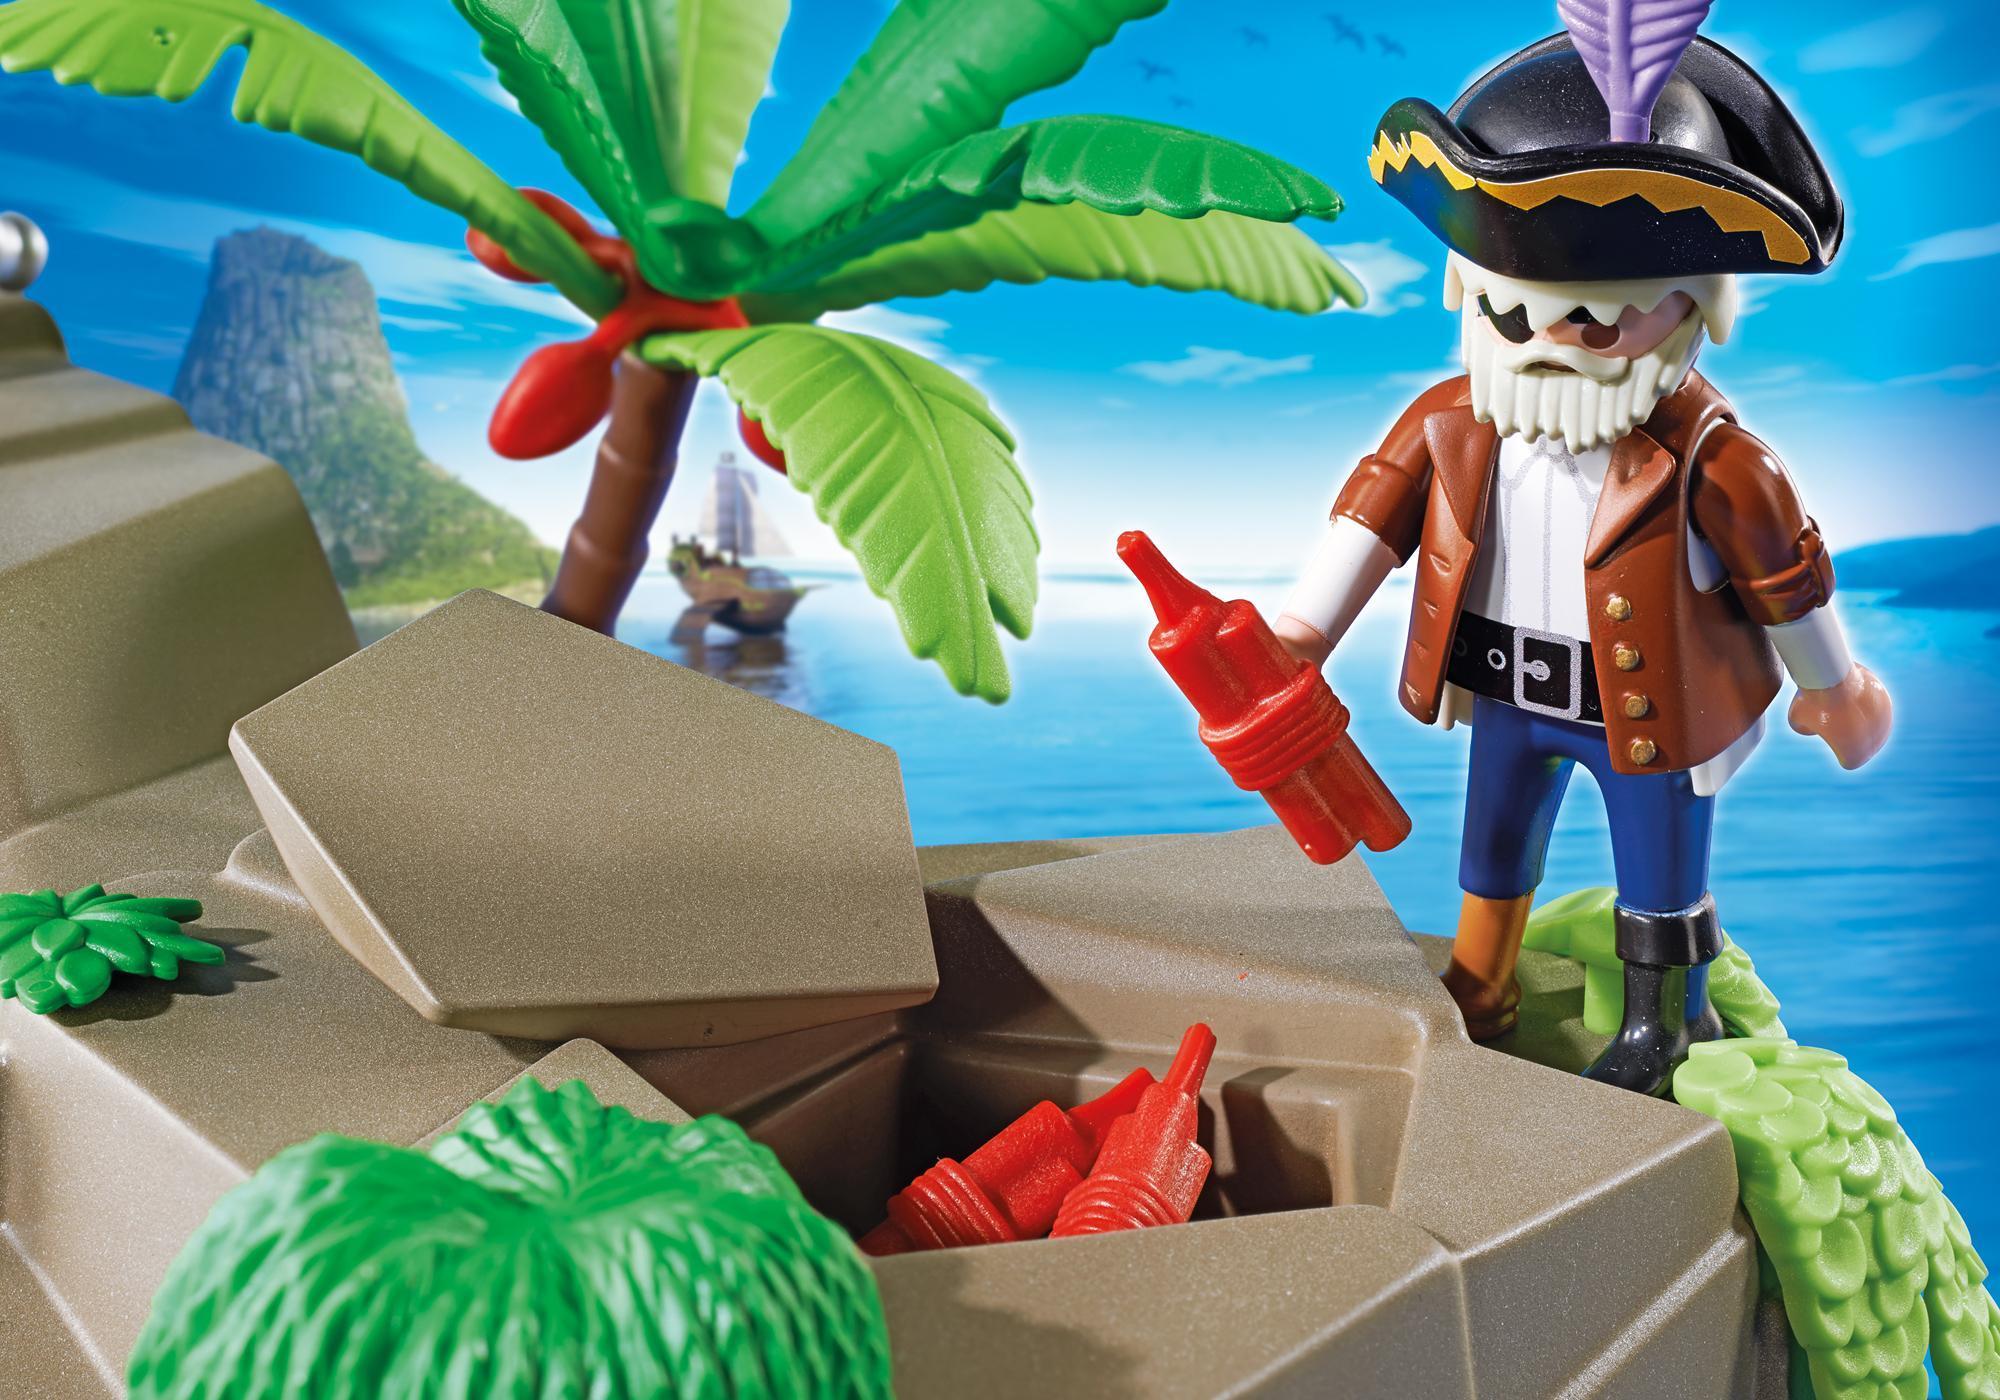 http://media.playmobil.com/i/playmobil/4797_product_extra1